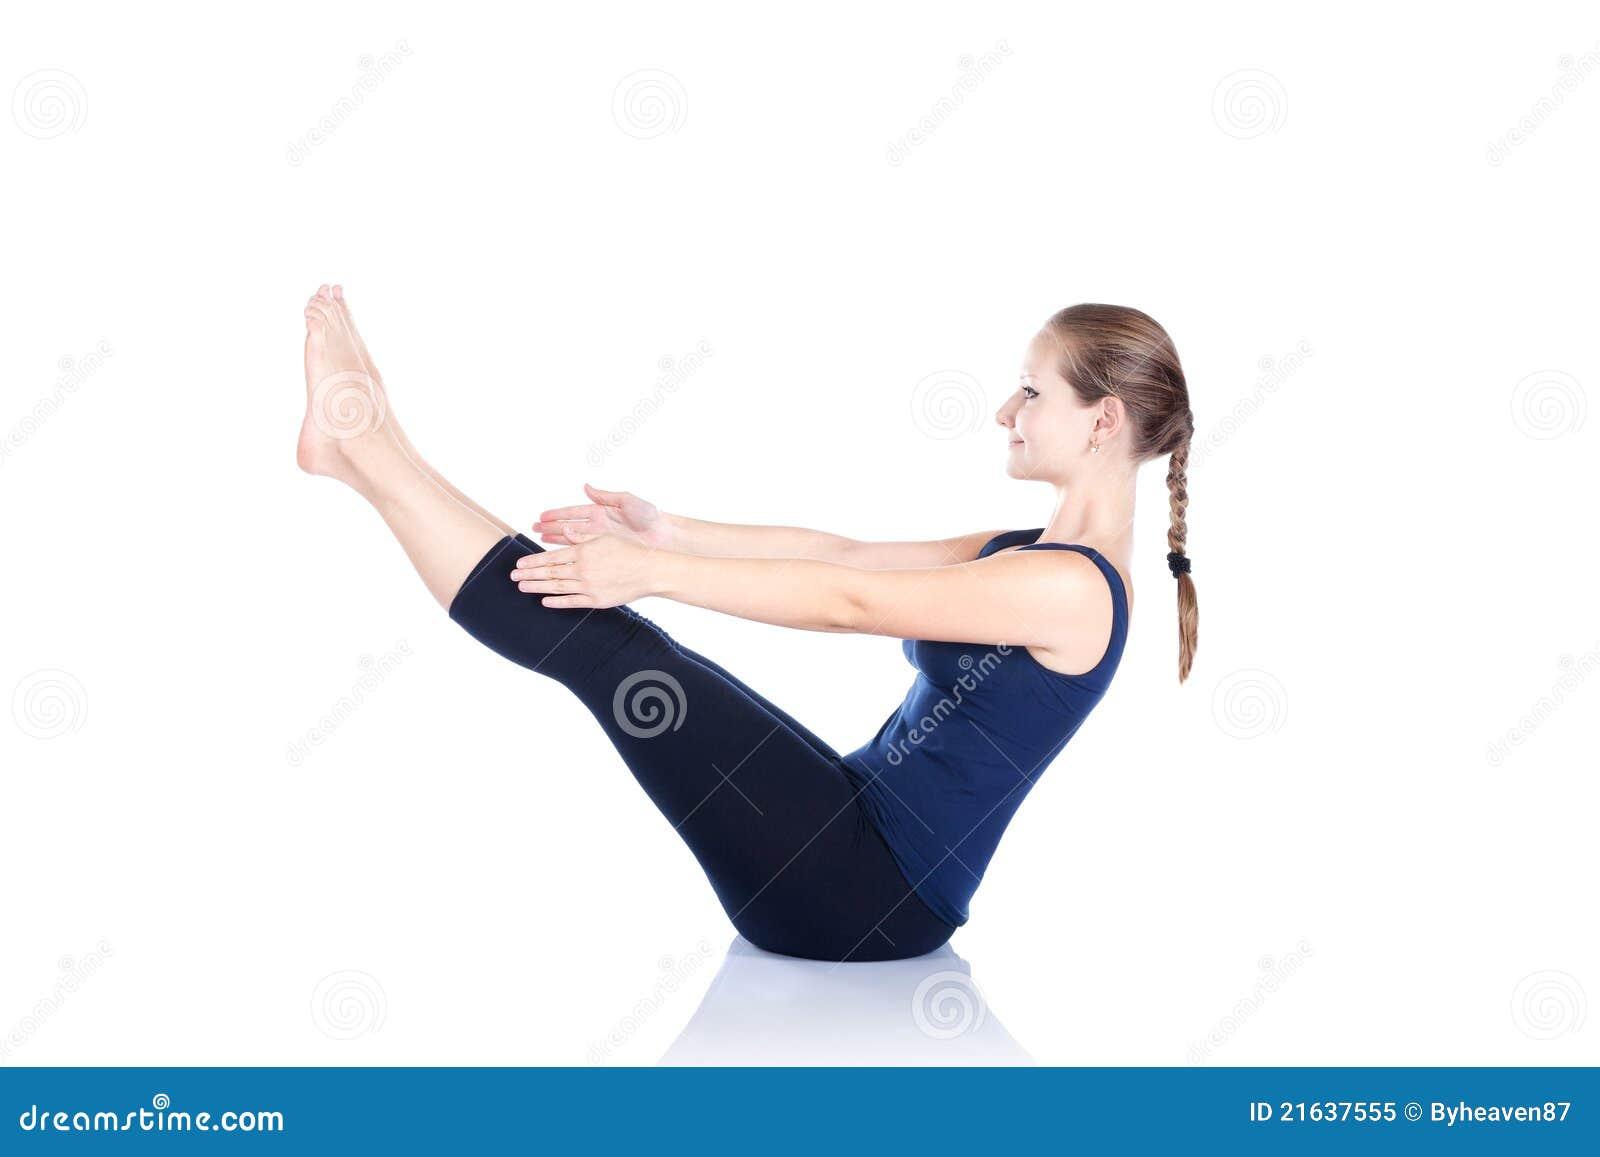 Yoga Paripurna Navasana Haltung Stockbild   Bild von exemplar ...